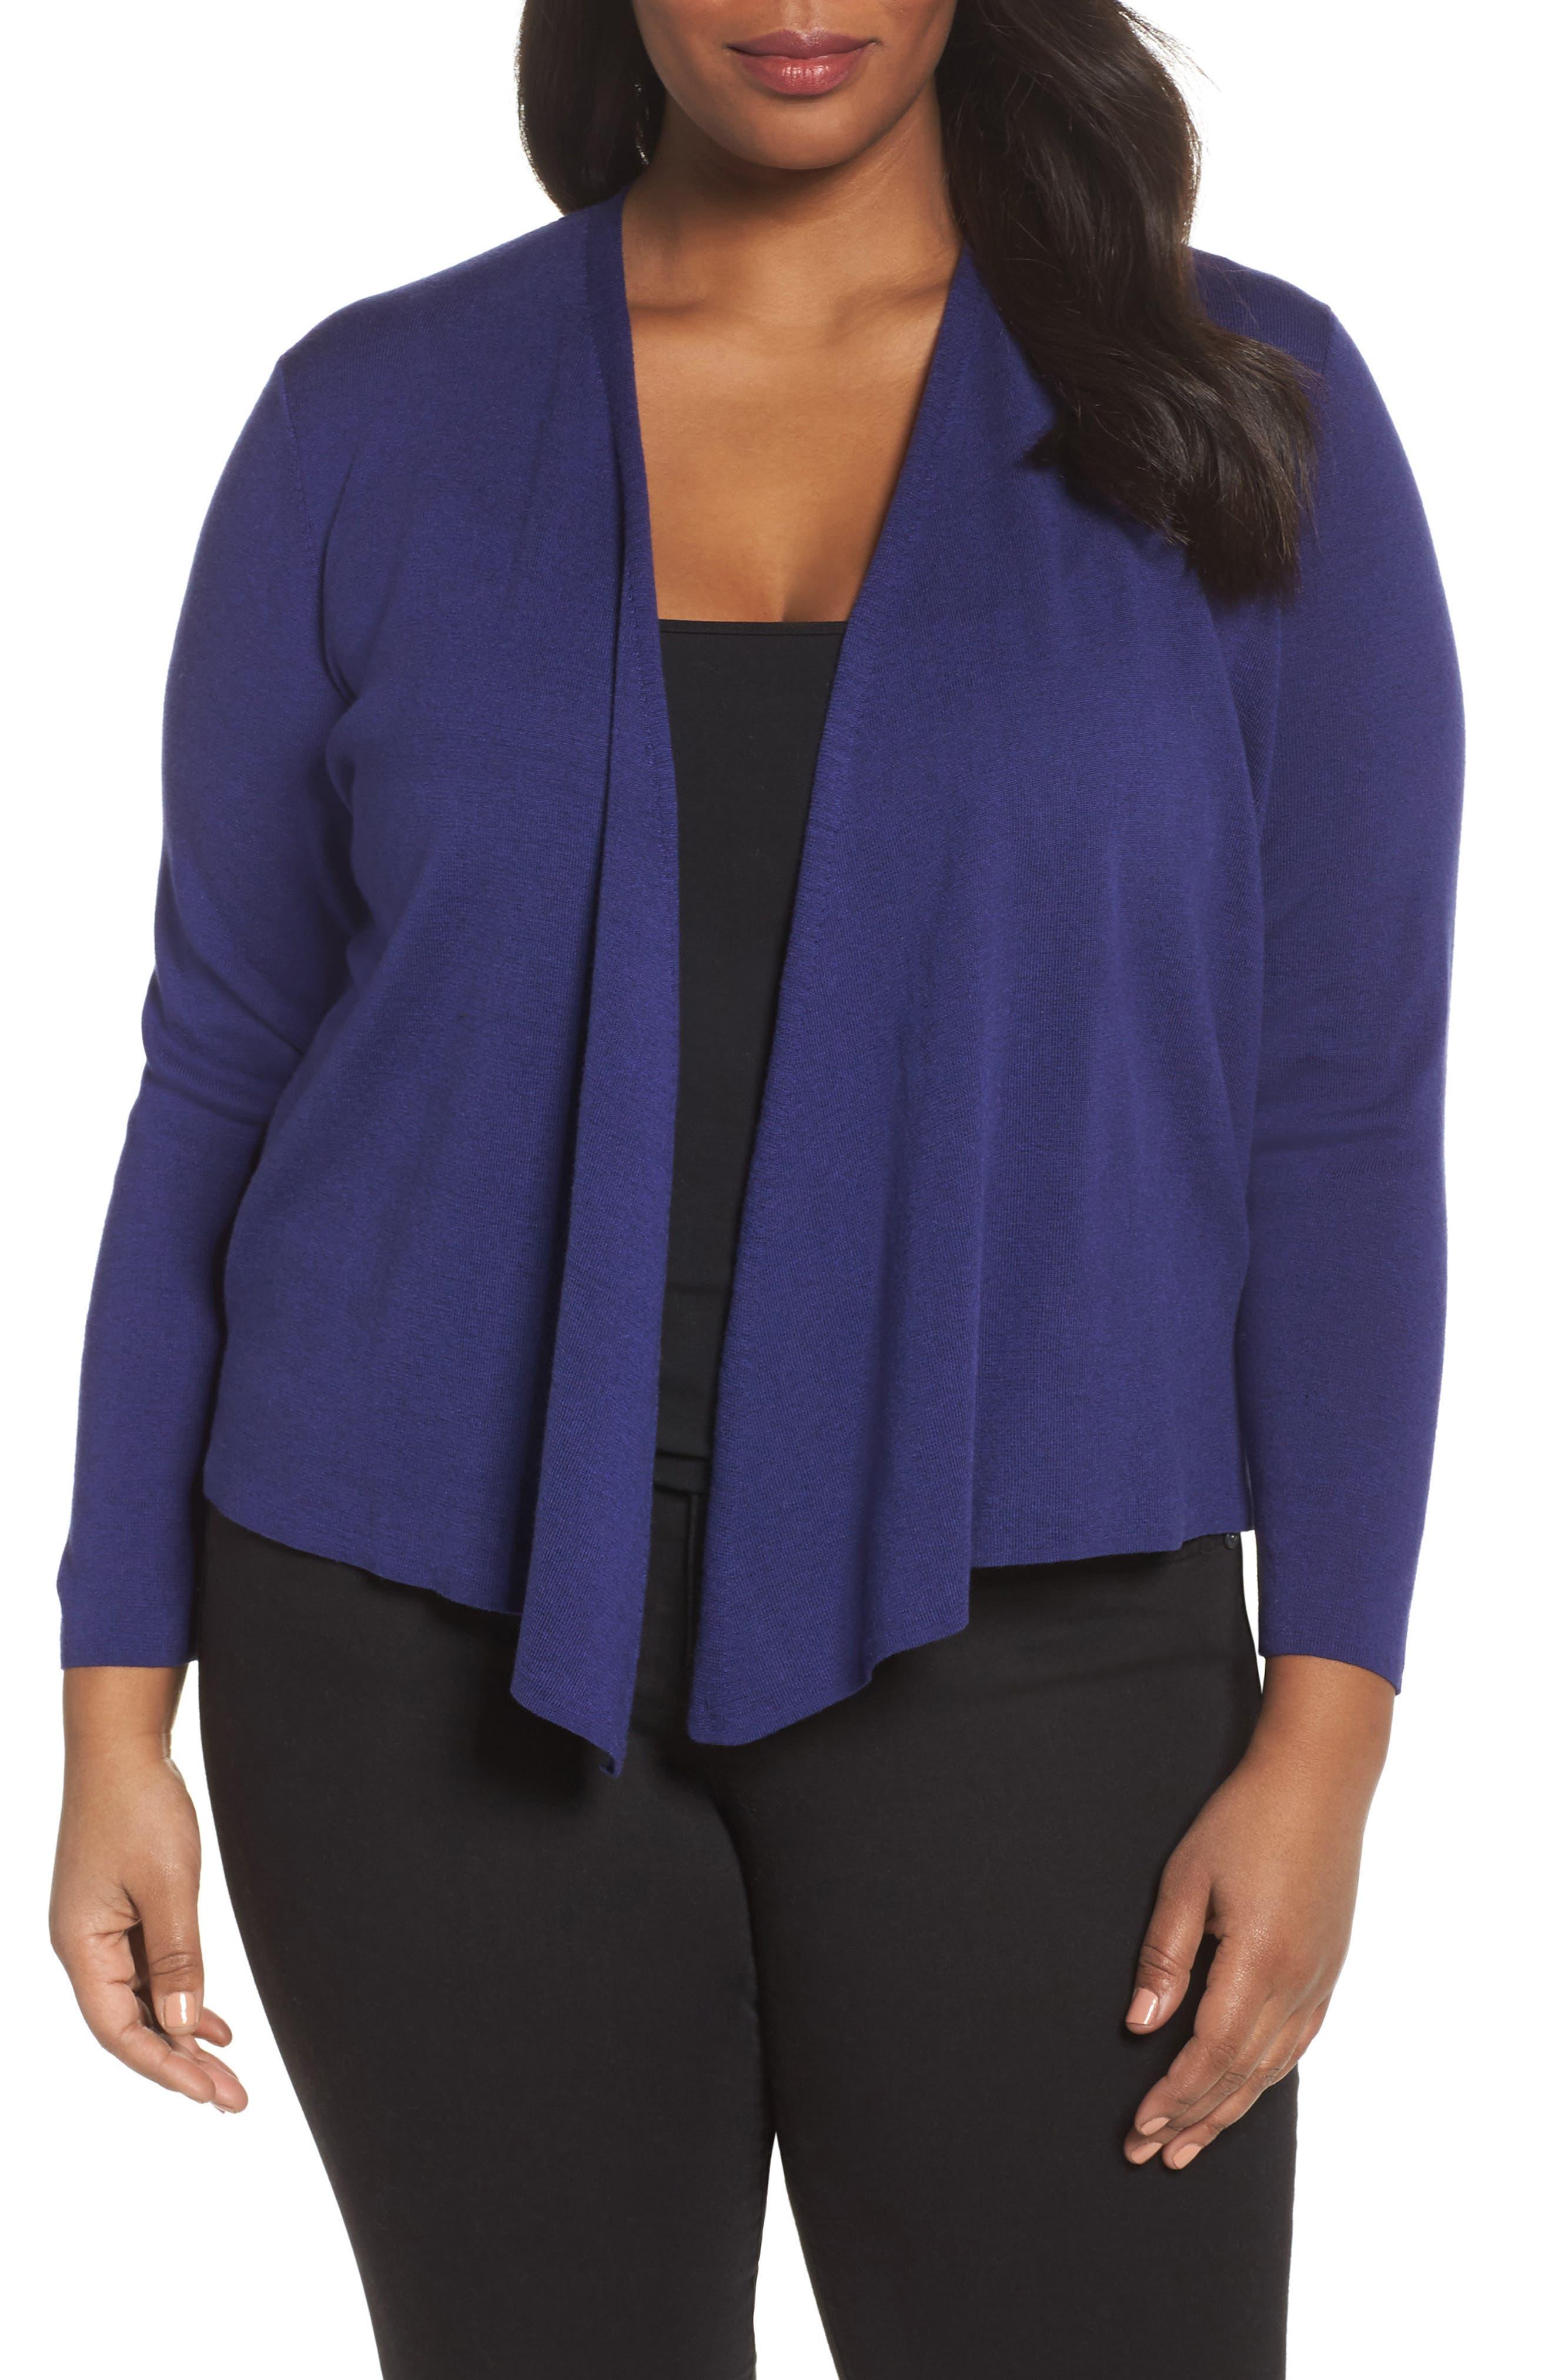 4-Way Convertible Cardigan,                         Main,                         color, Electric Blue